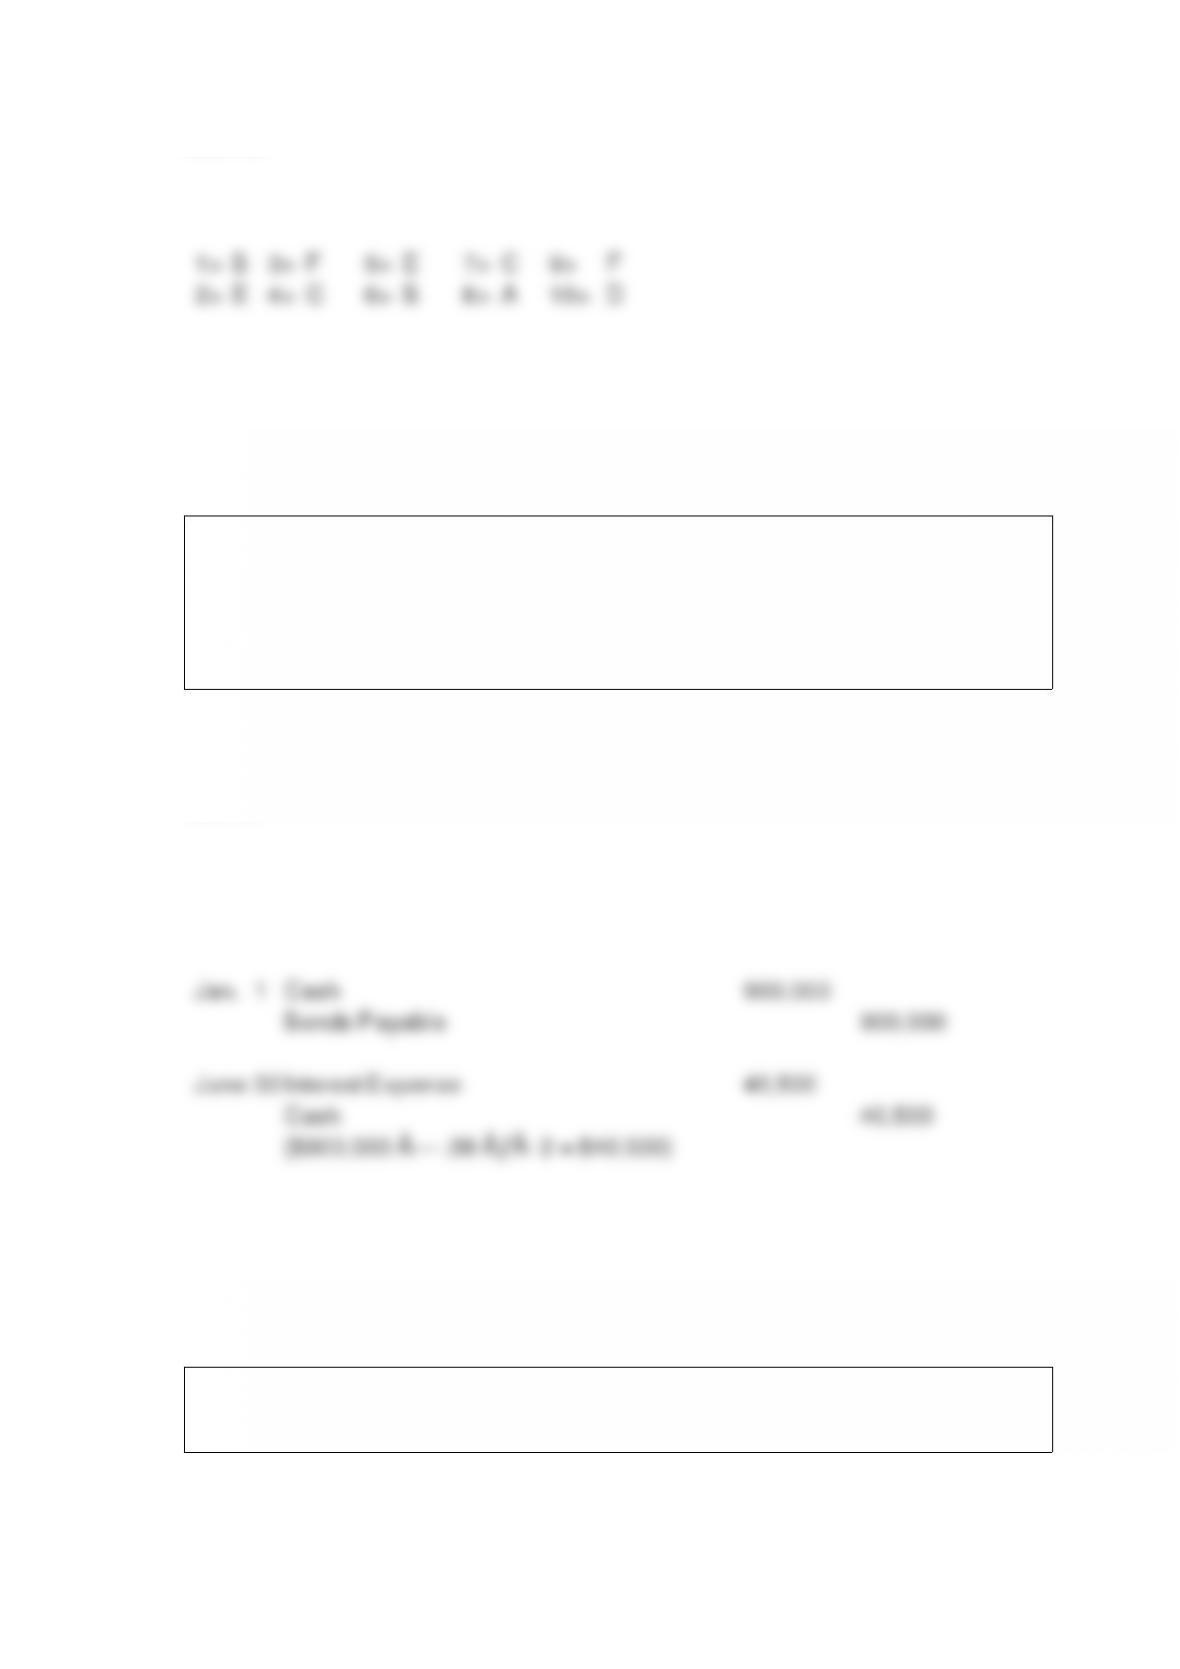 Accounting 286 Quiz 2